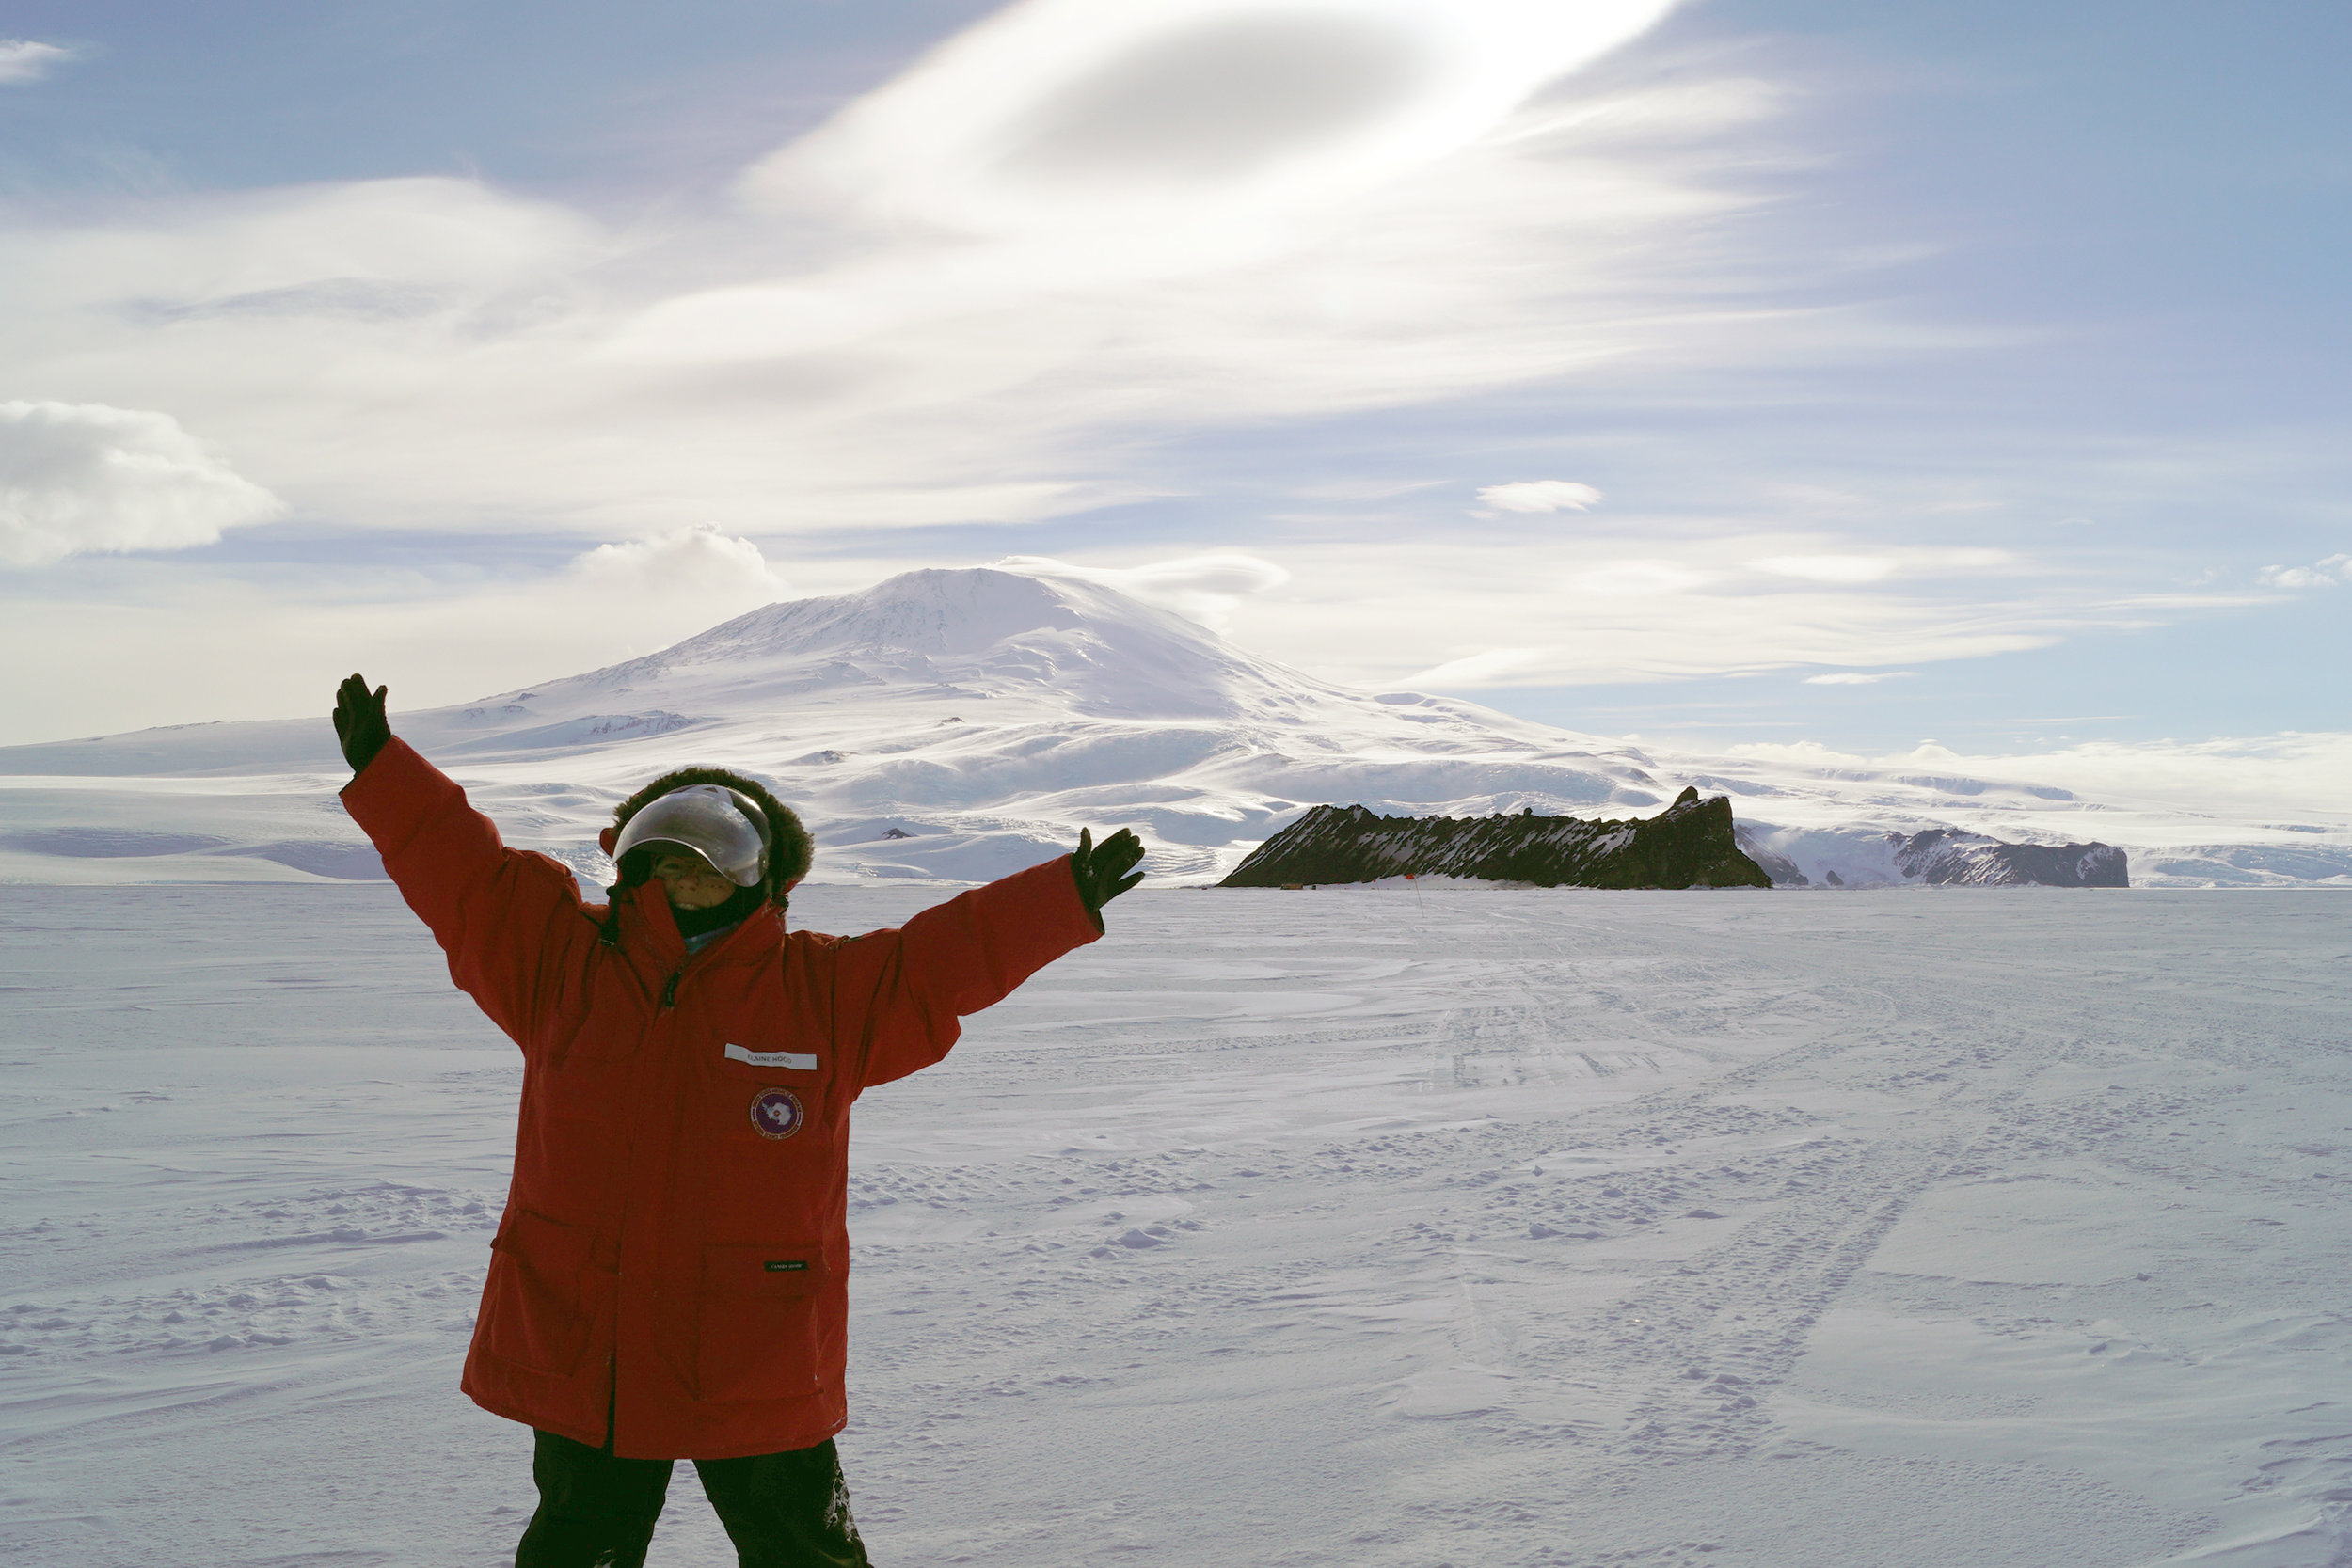 In front of Mt. Erebus. Photo credit: Elaine Hood.